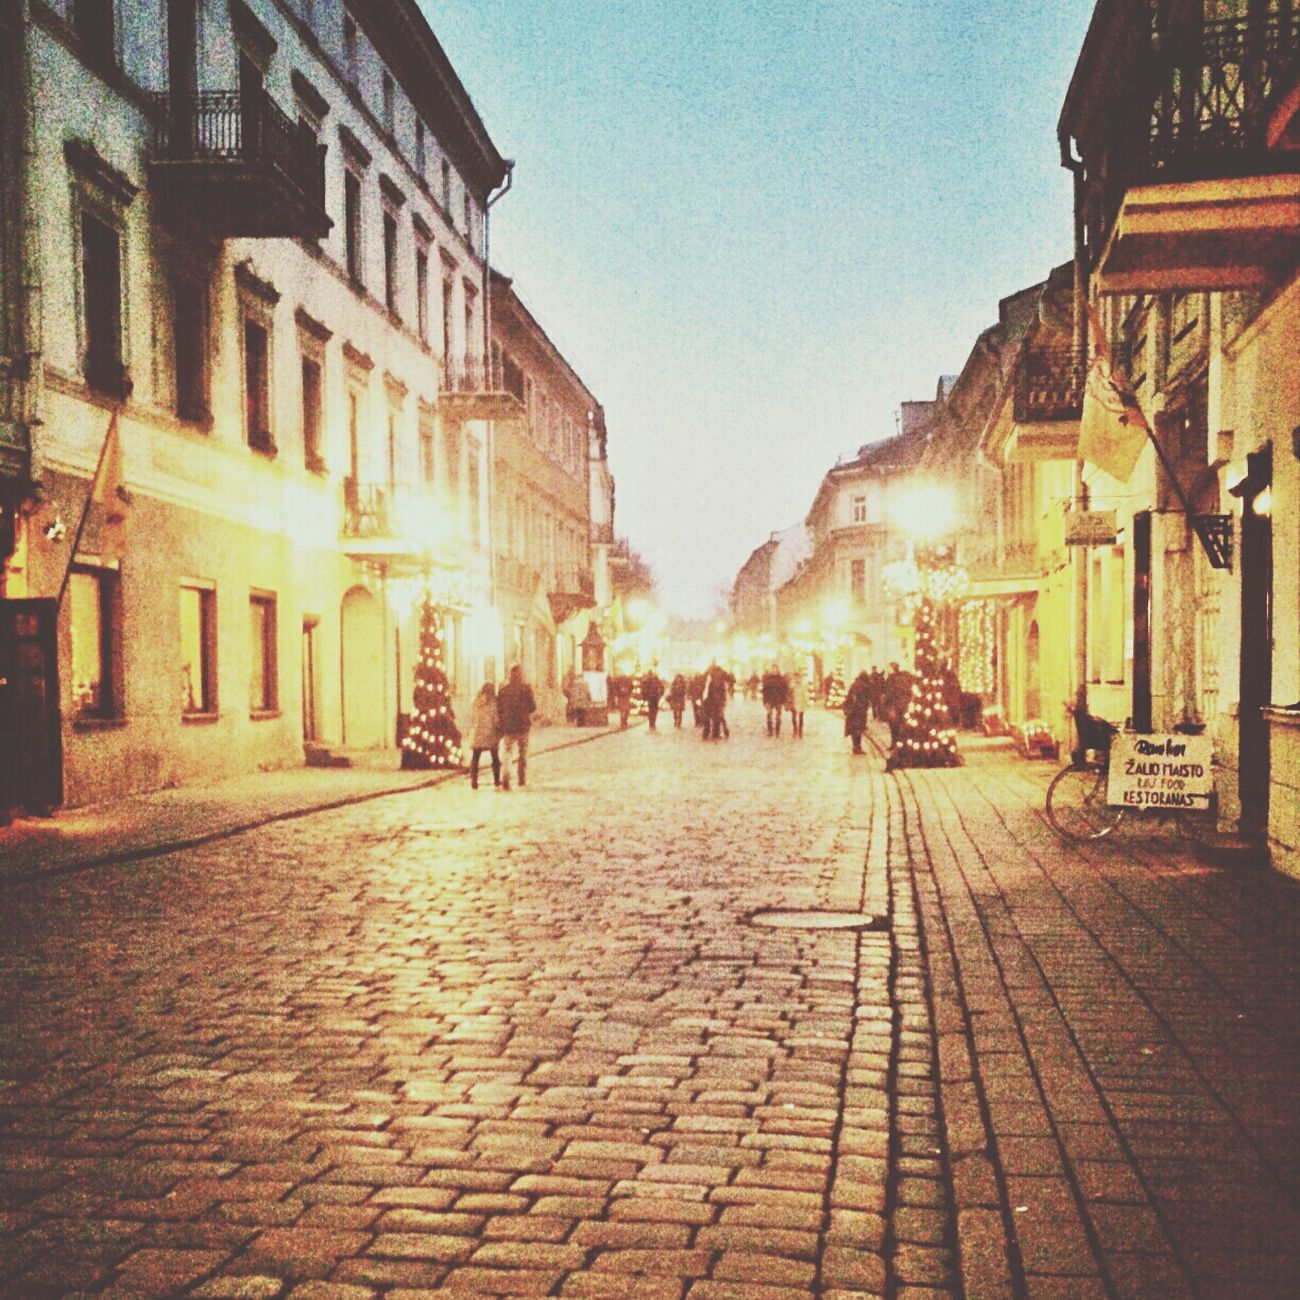 Senamiestis (oldtown) Streetphotography Evening